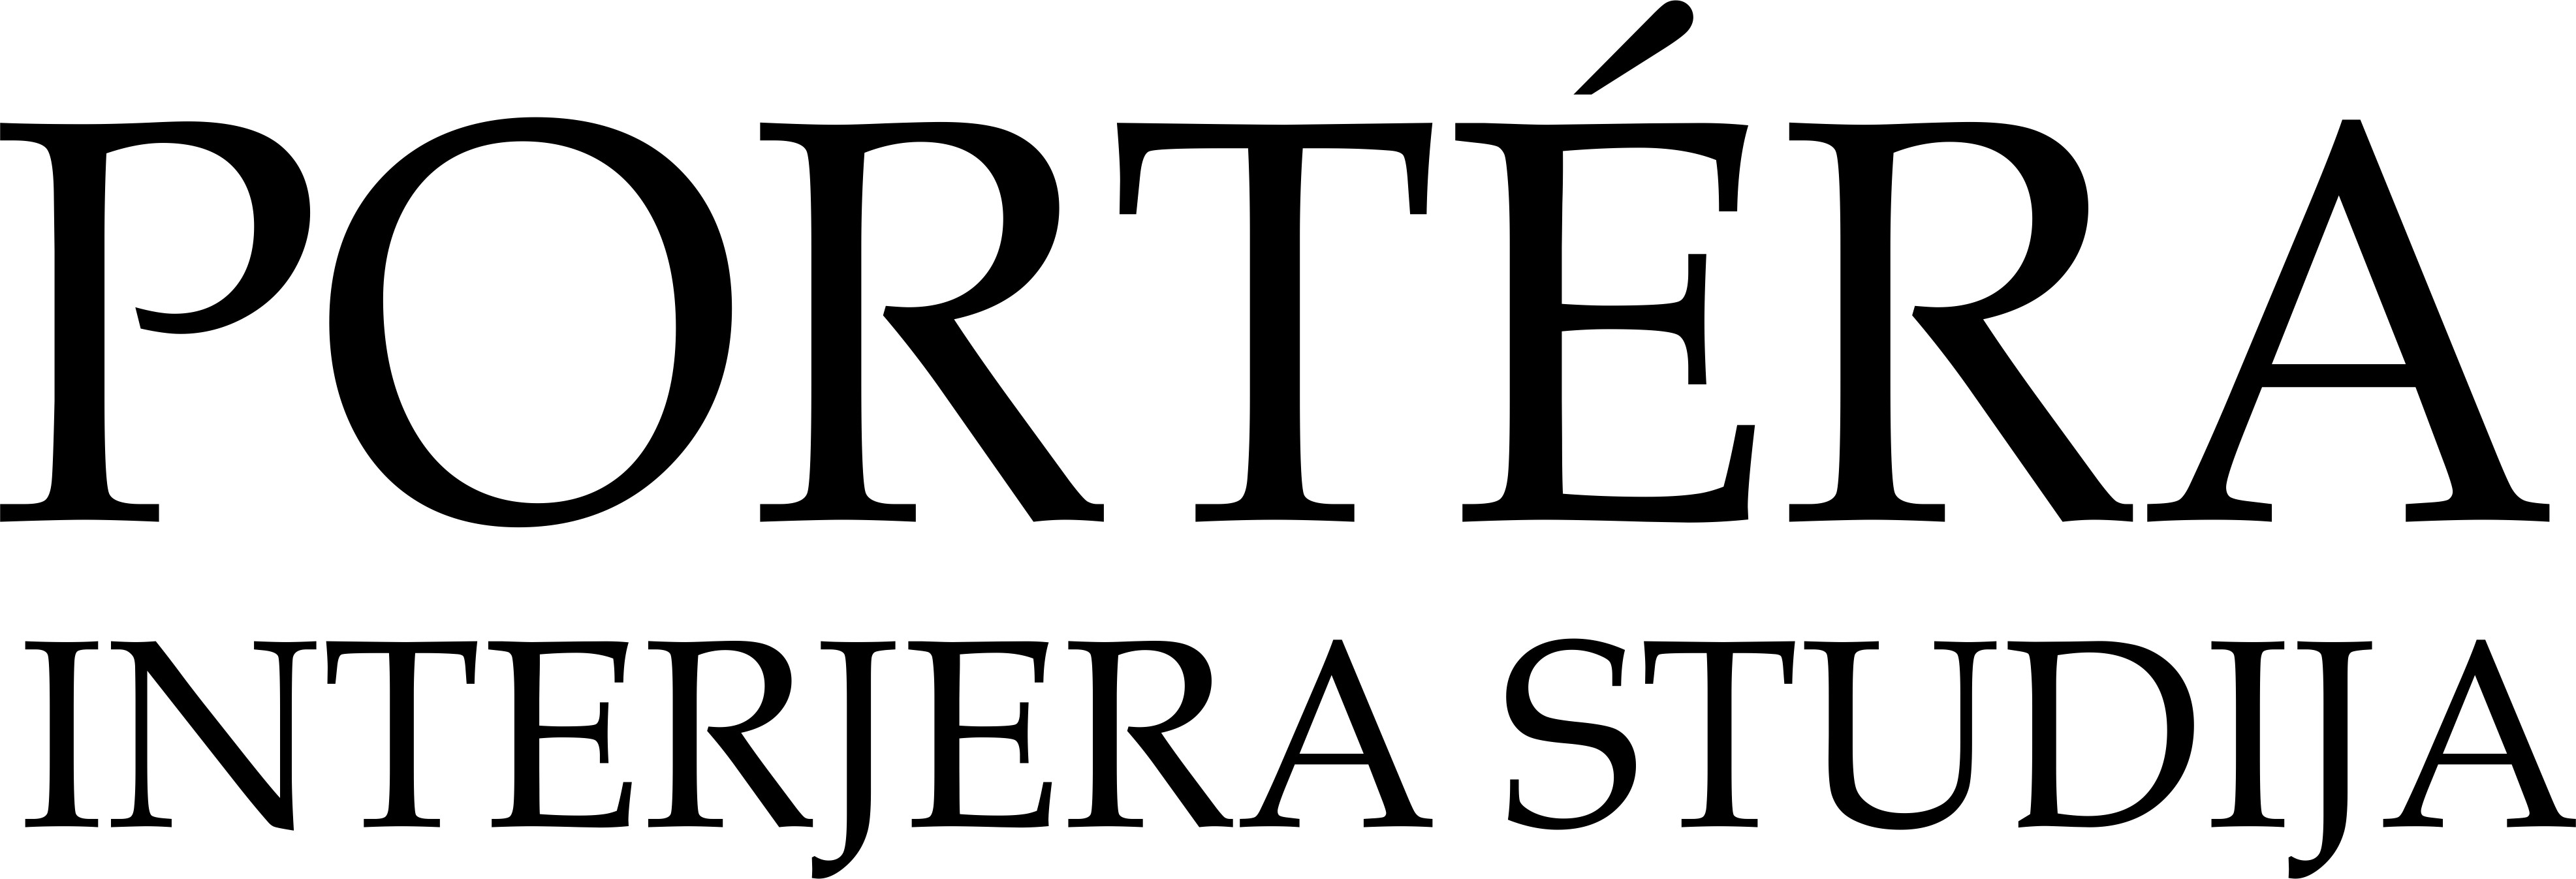 Portera